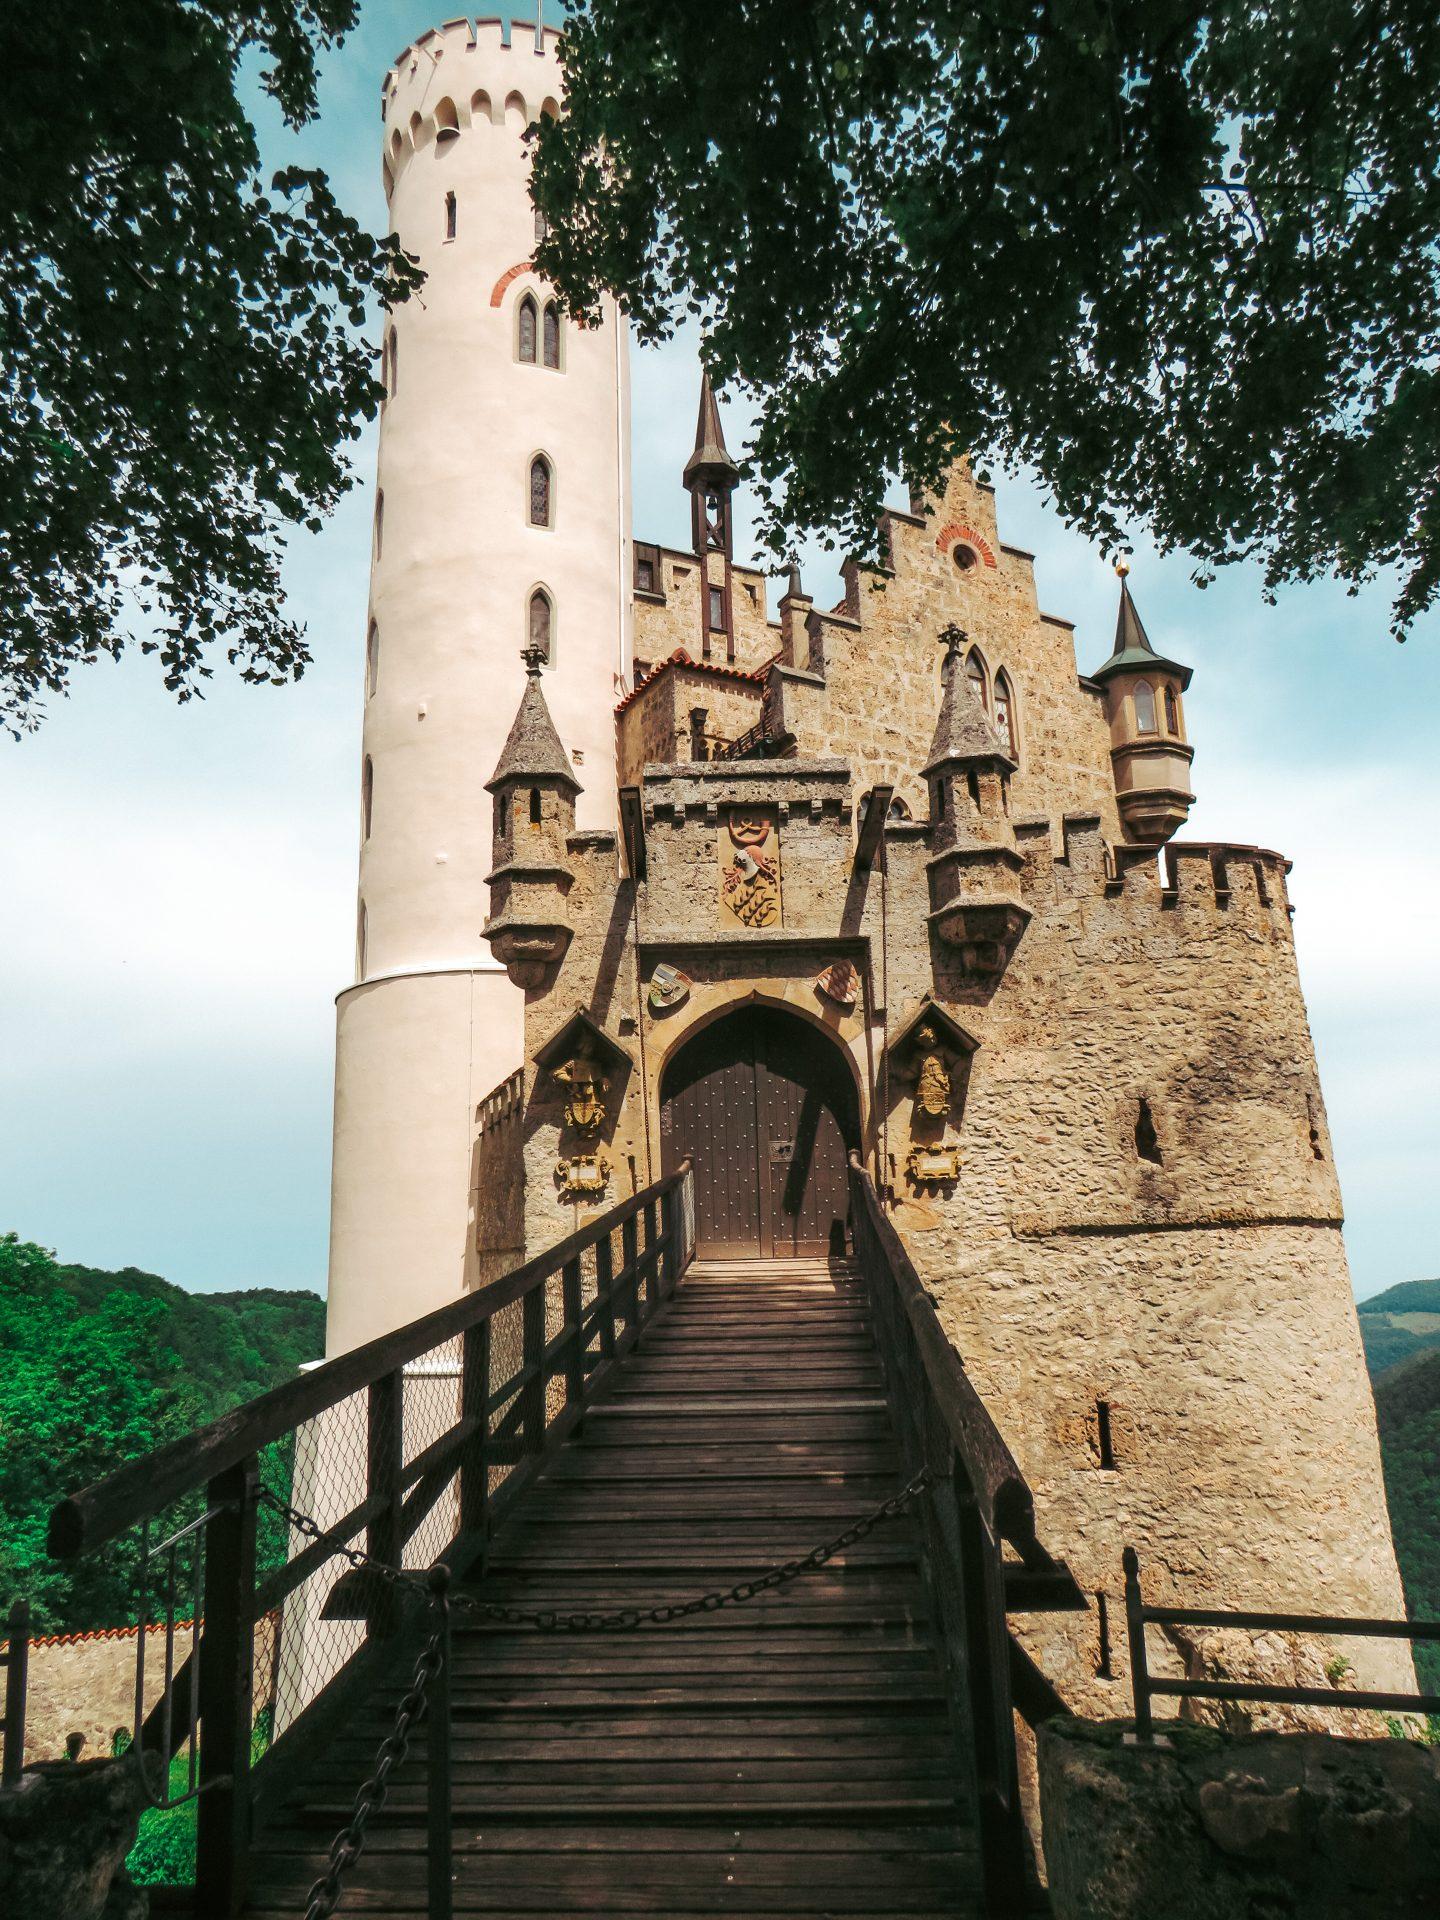 liechtenstein-castle-germany